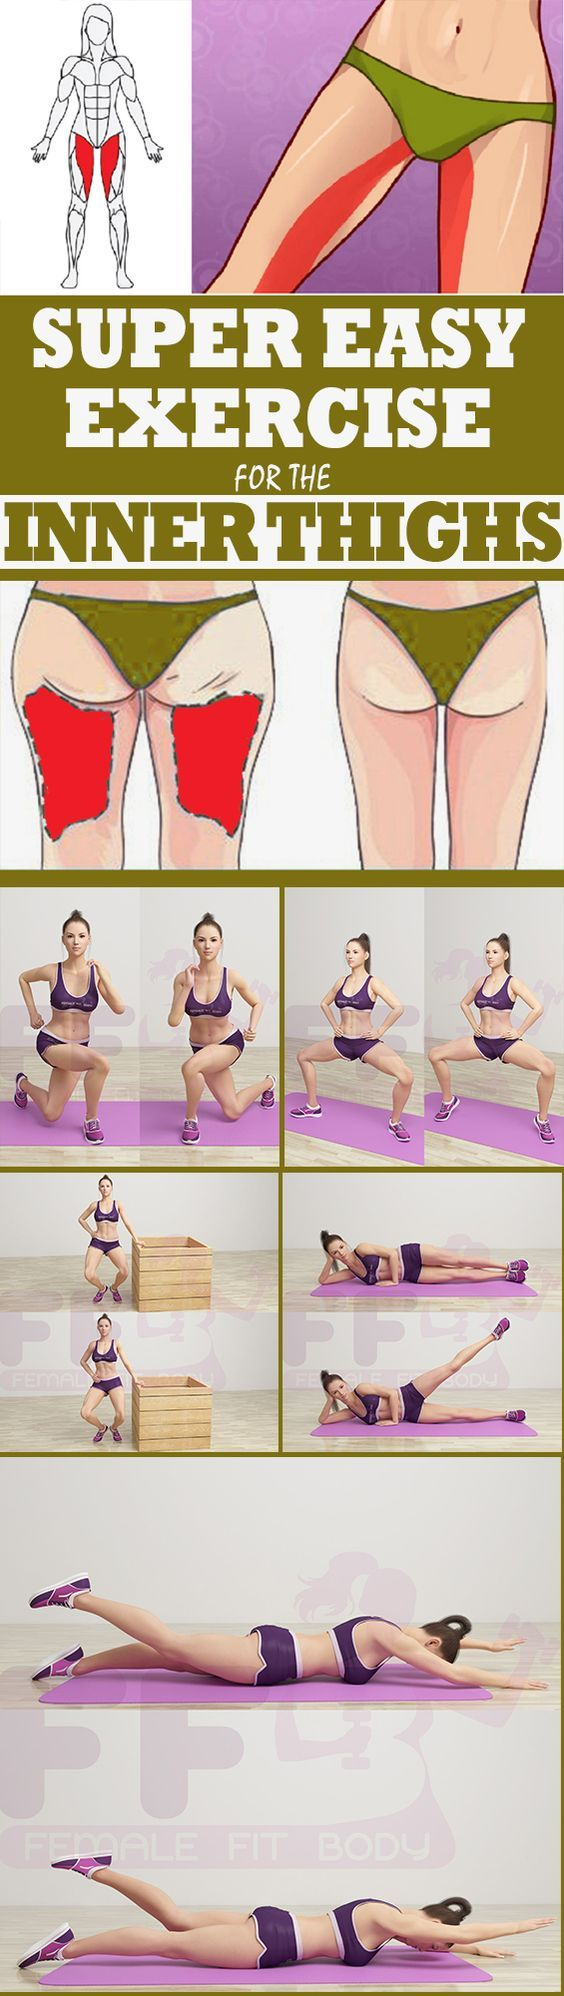 Weight loss programs bozeman mt